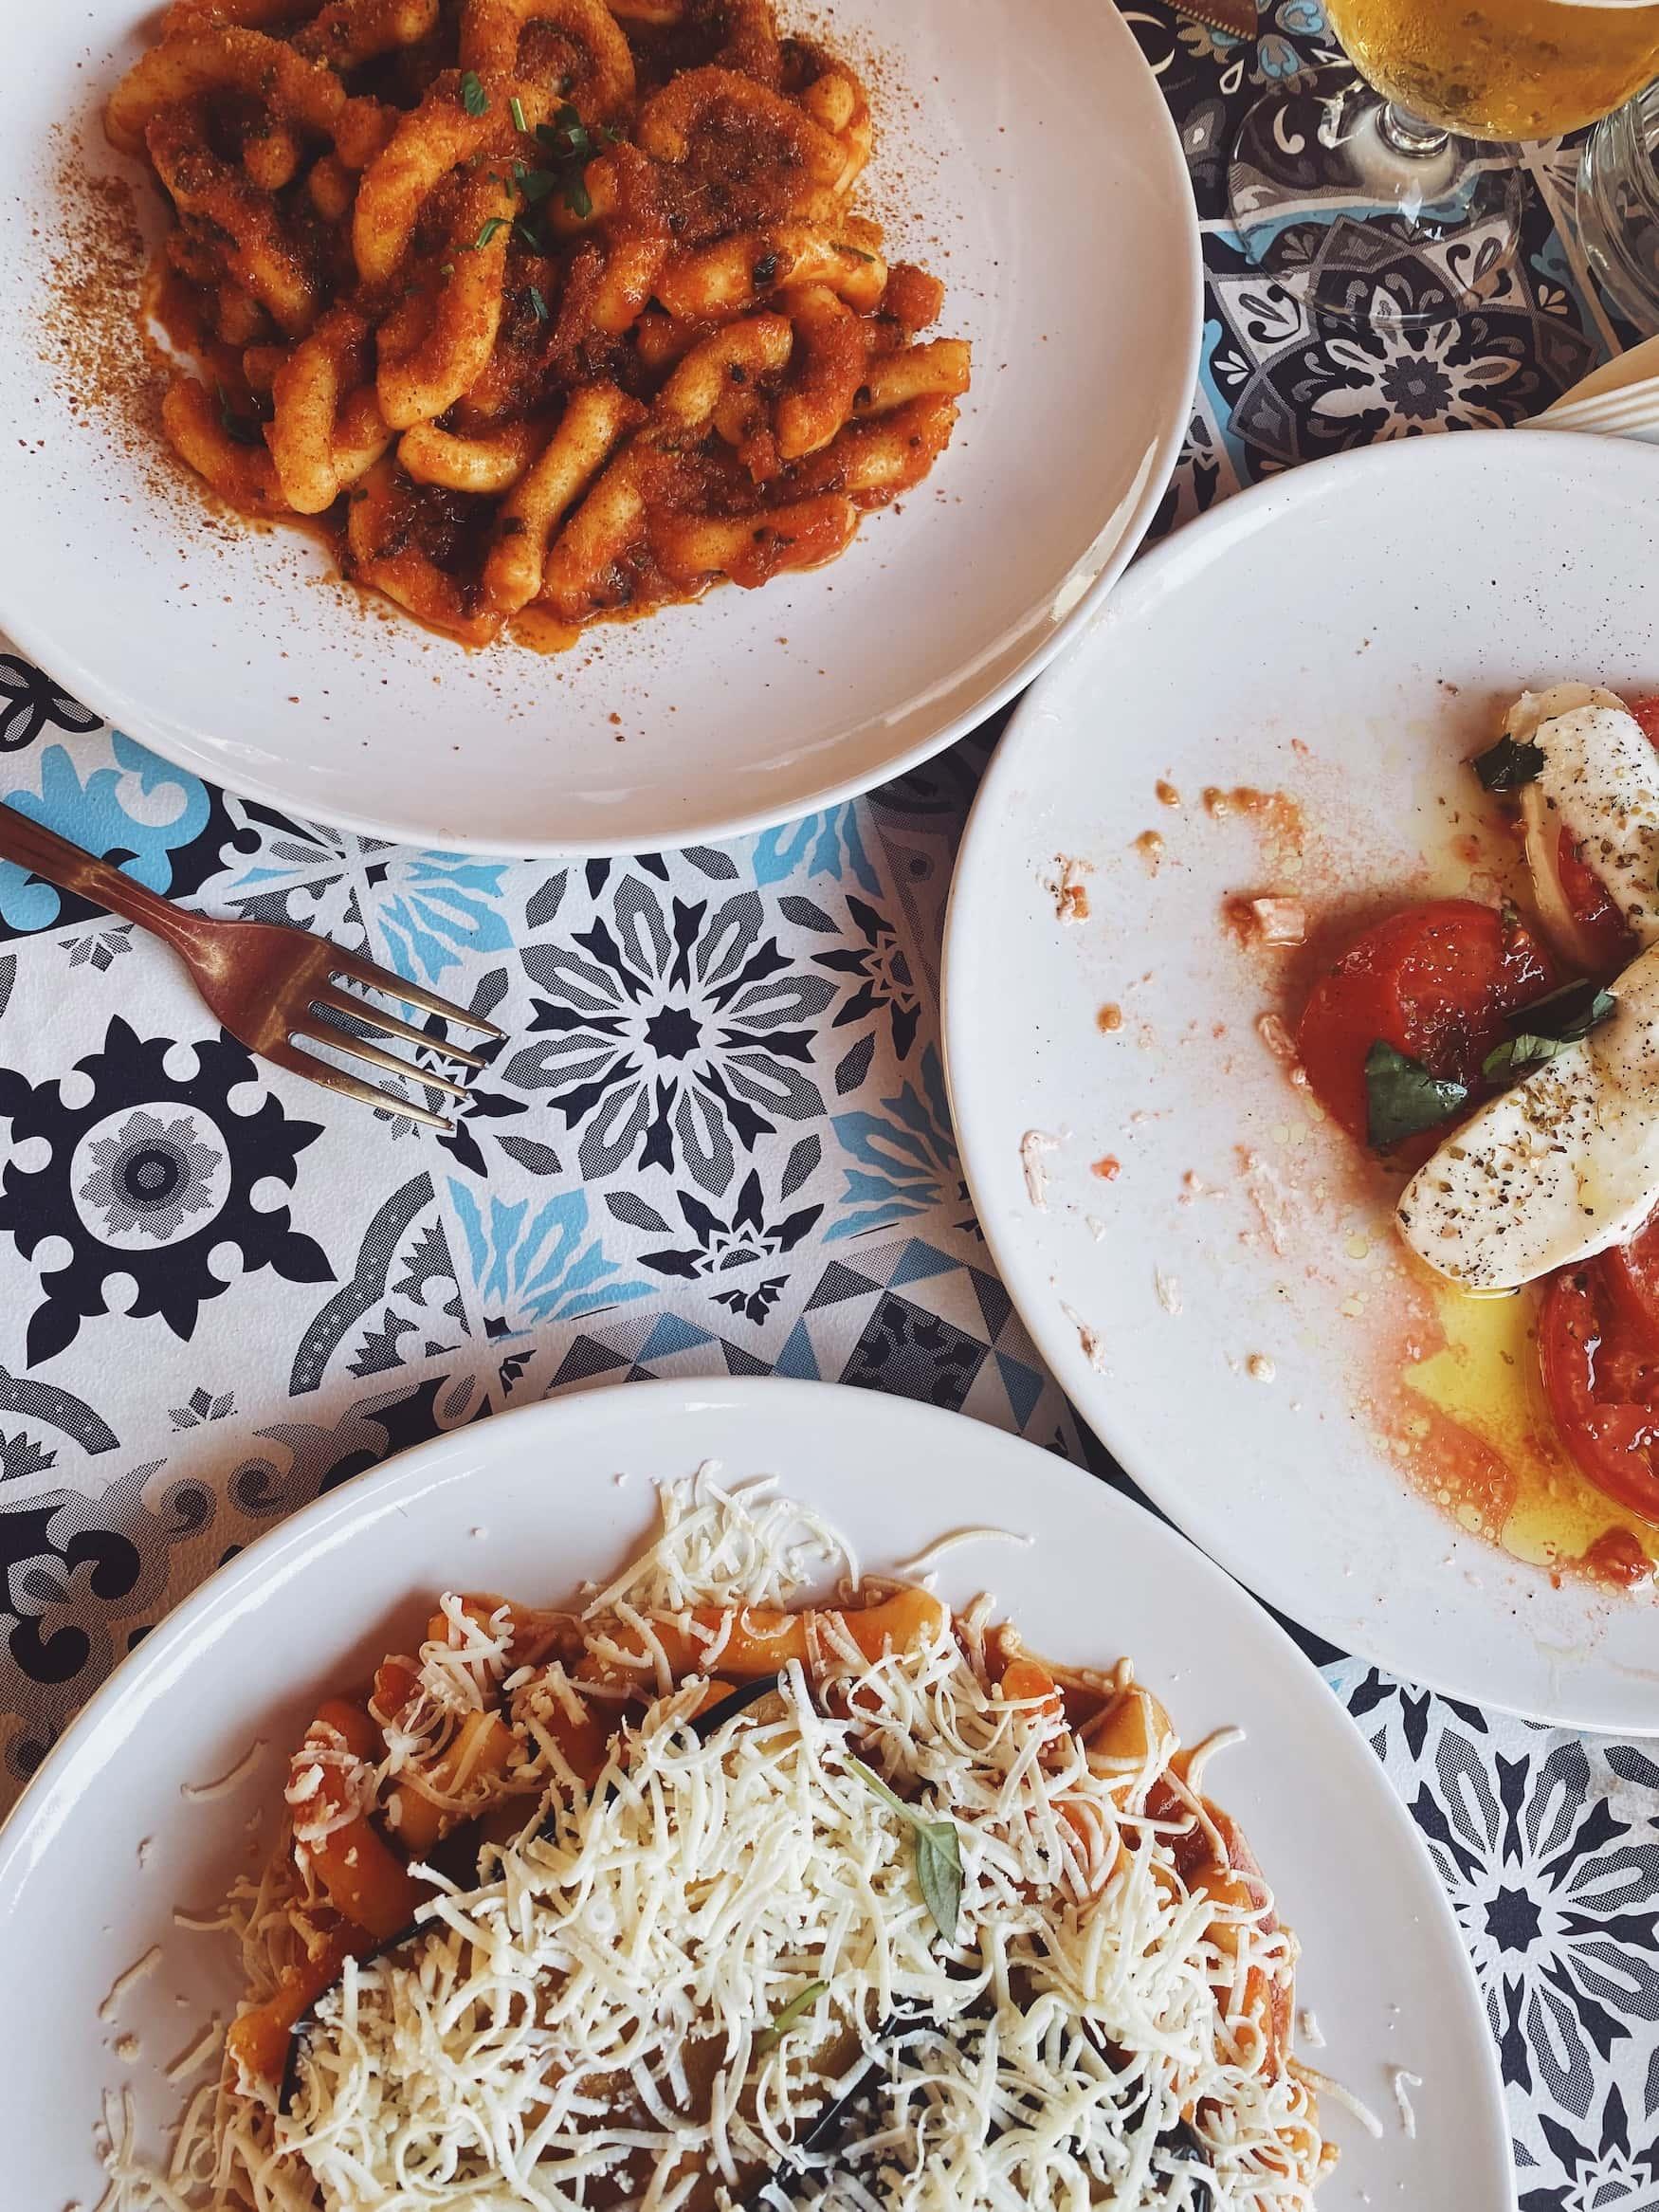 Pasta alla Norma - Pasta mti Tomatensoße, Auberginen und salzigem Ricotta.